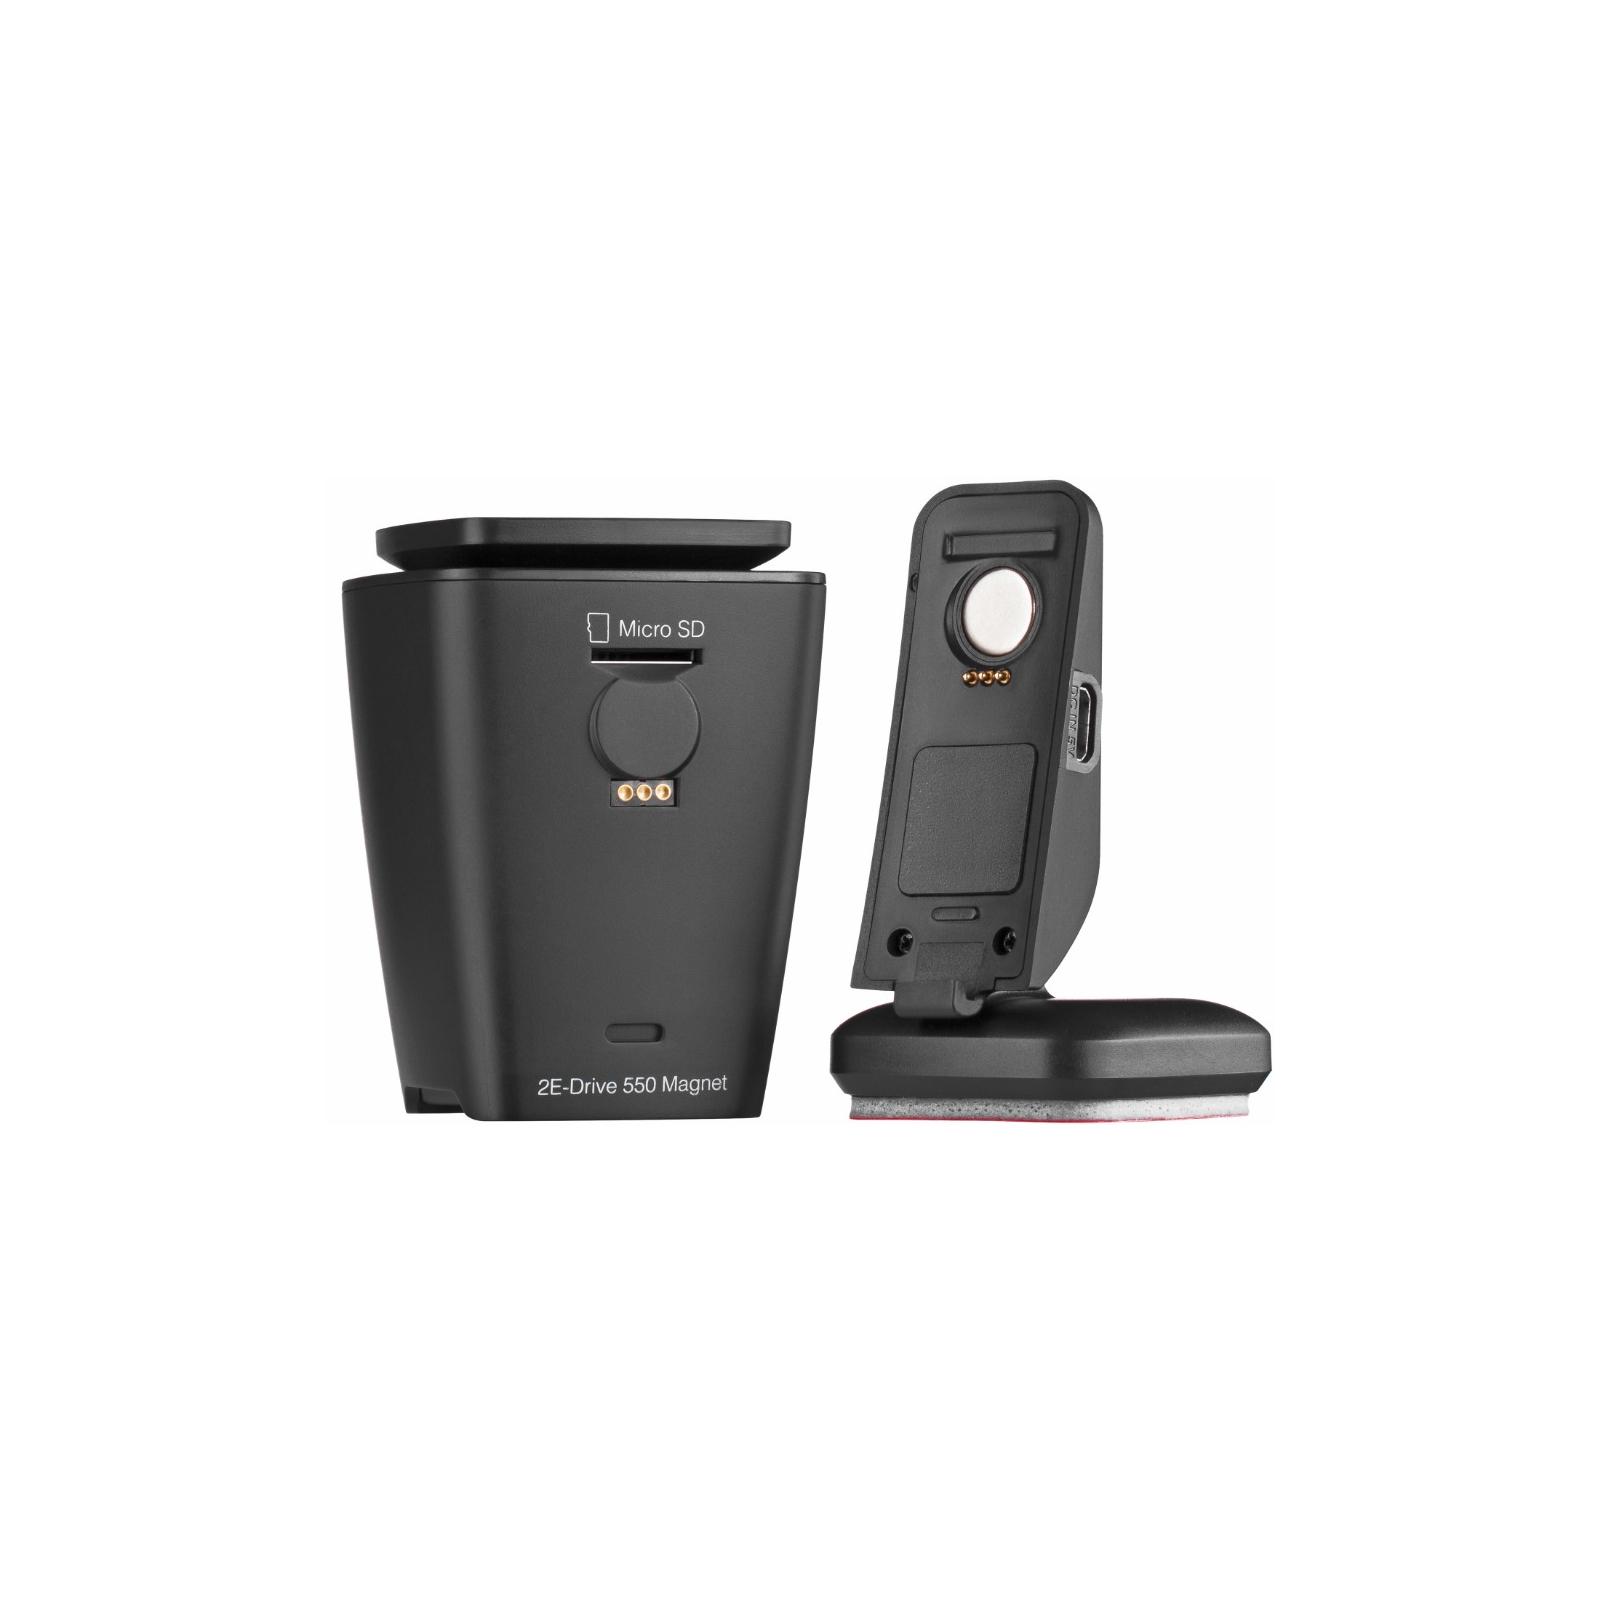 Відеореєстратор 2E Drive 550 Magnet (2E-DRIVE550MAGNET) зображення 10